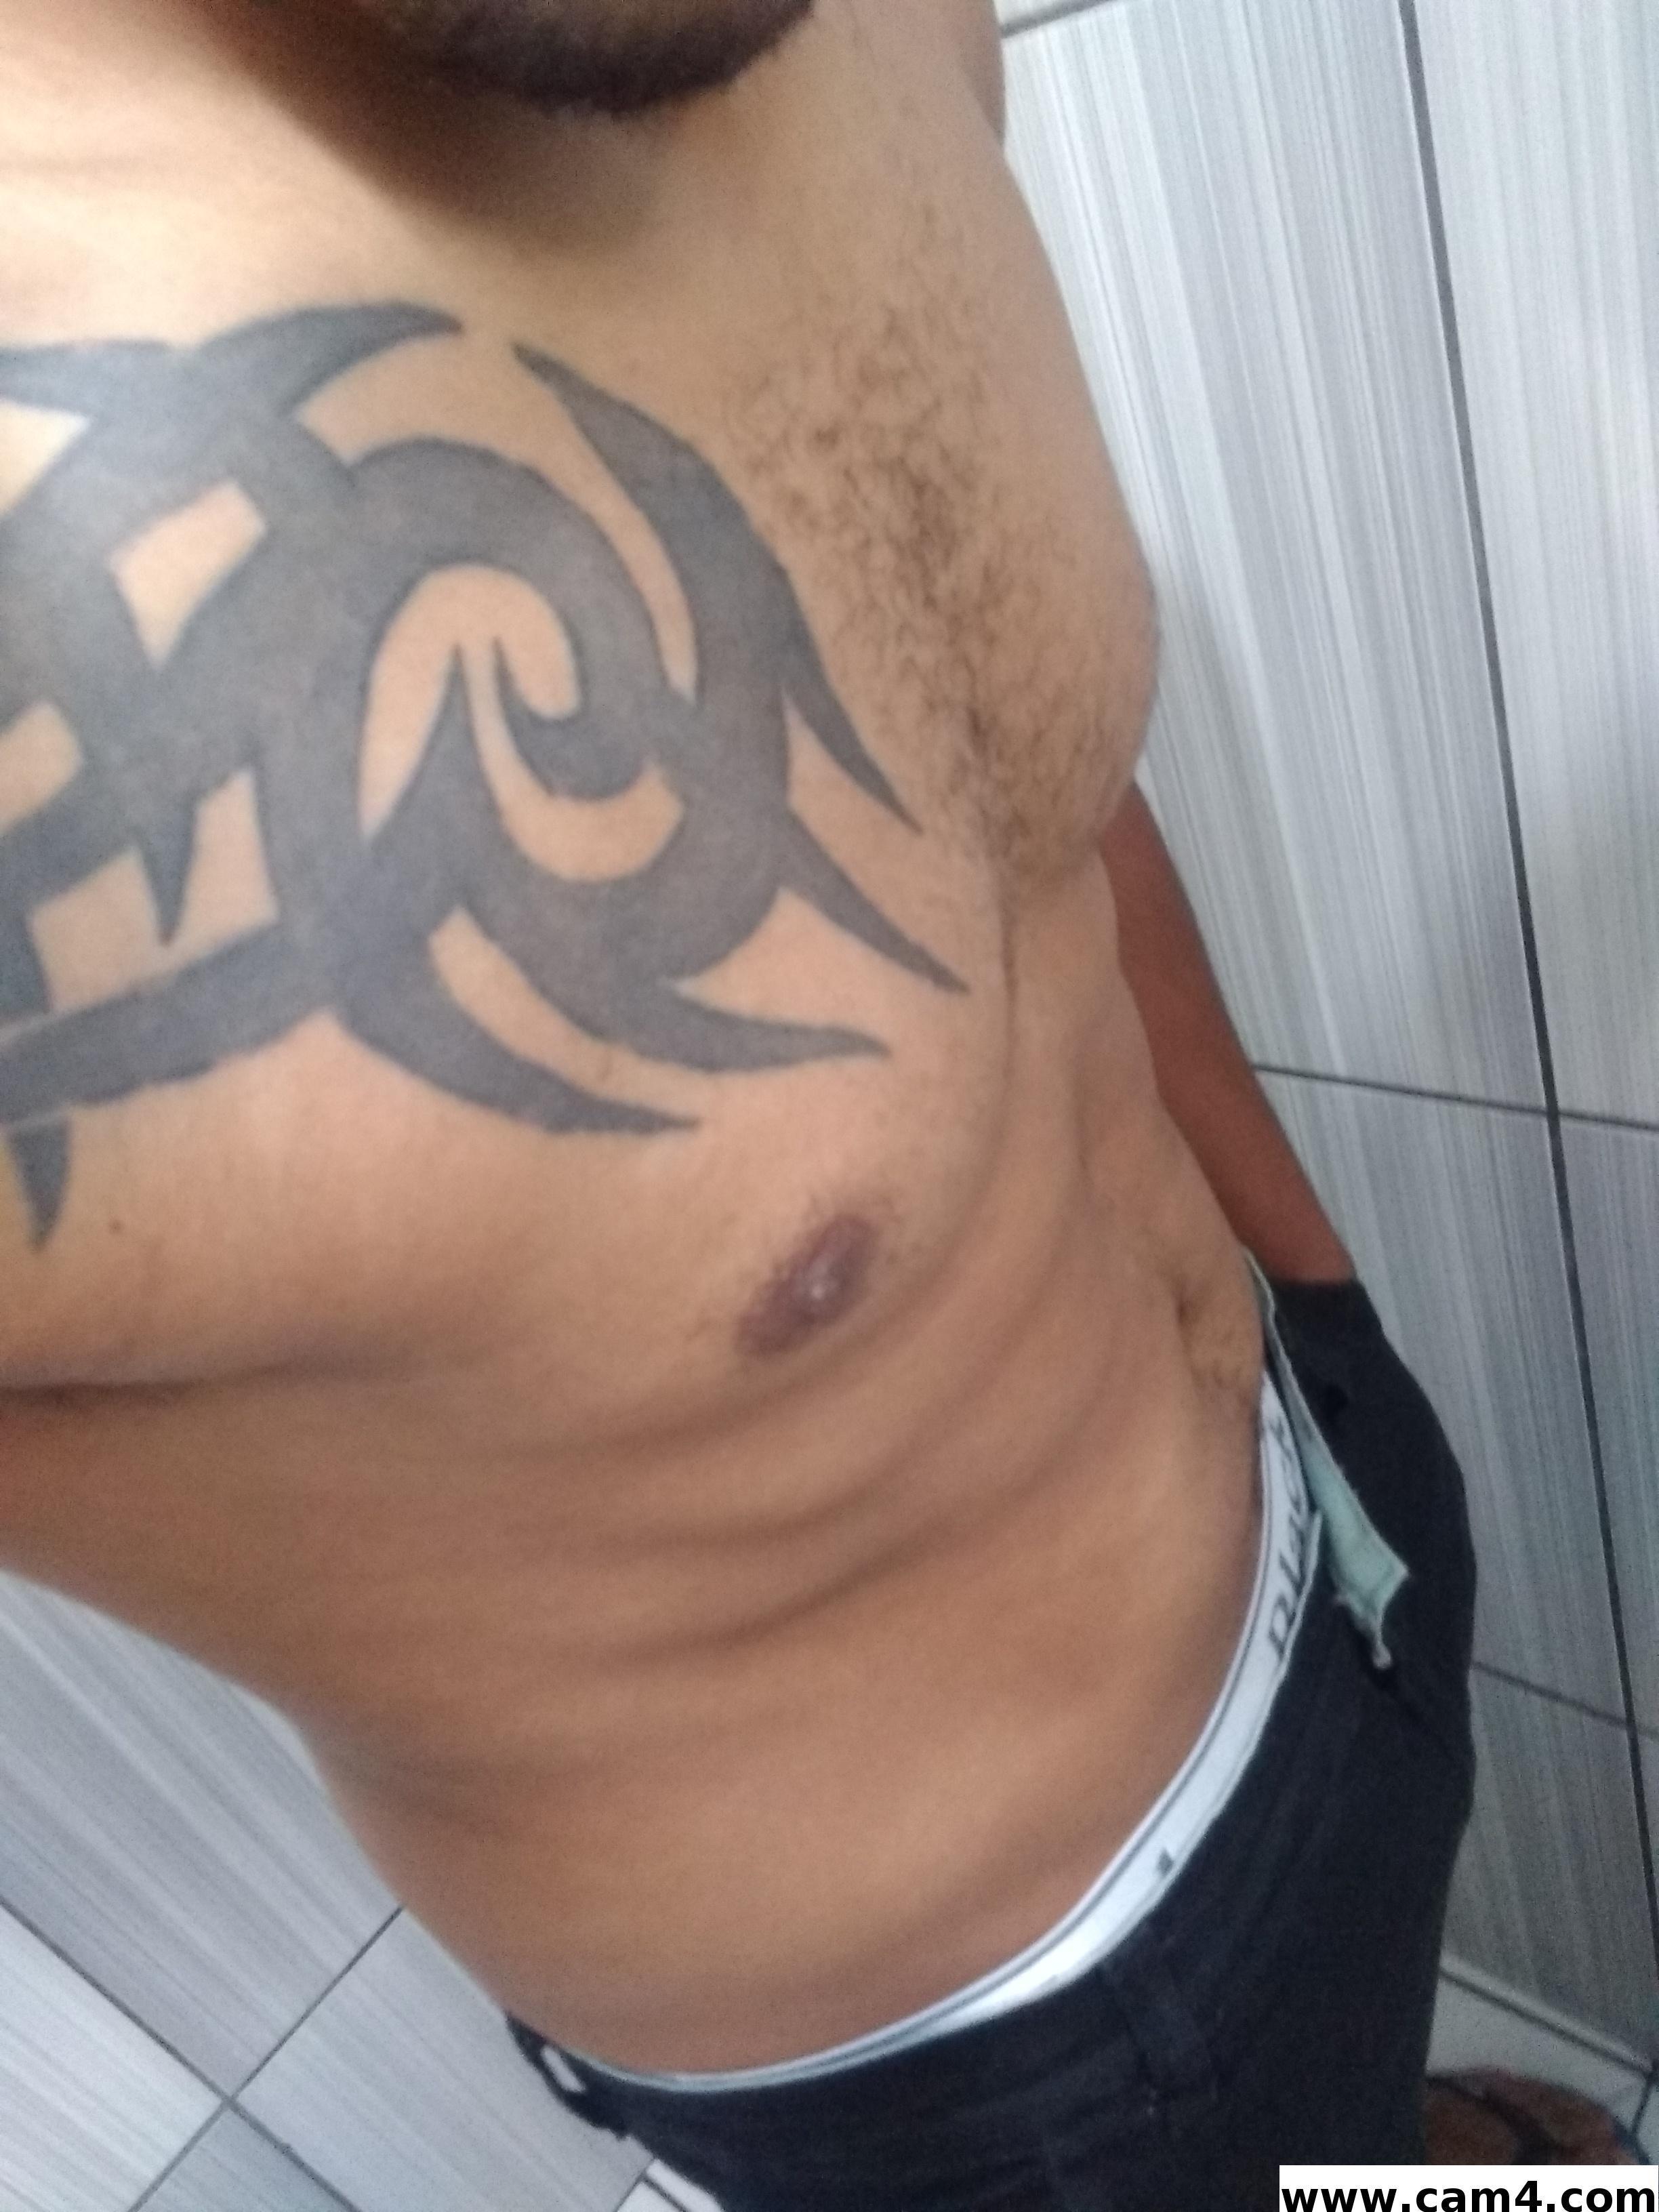 Evertongatoo?s=aum1+xs5dylyjsebzft8xludxv+klrel49aeb0hmos0=